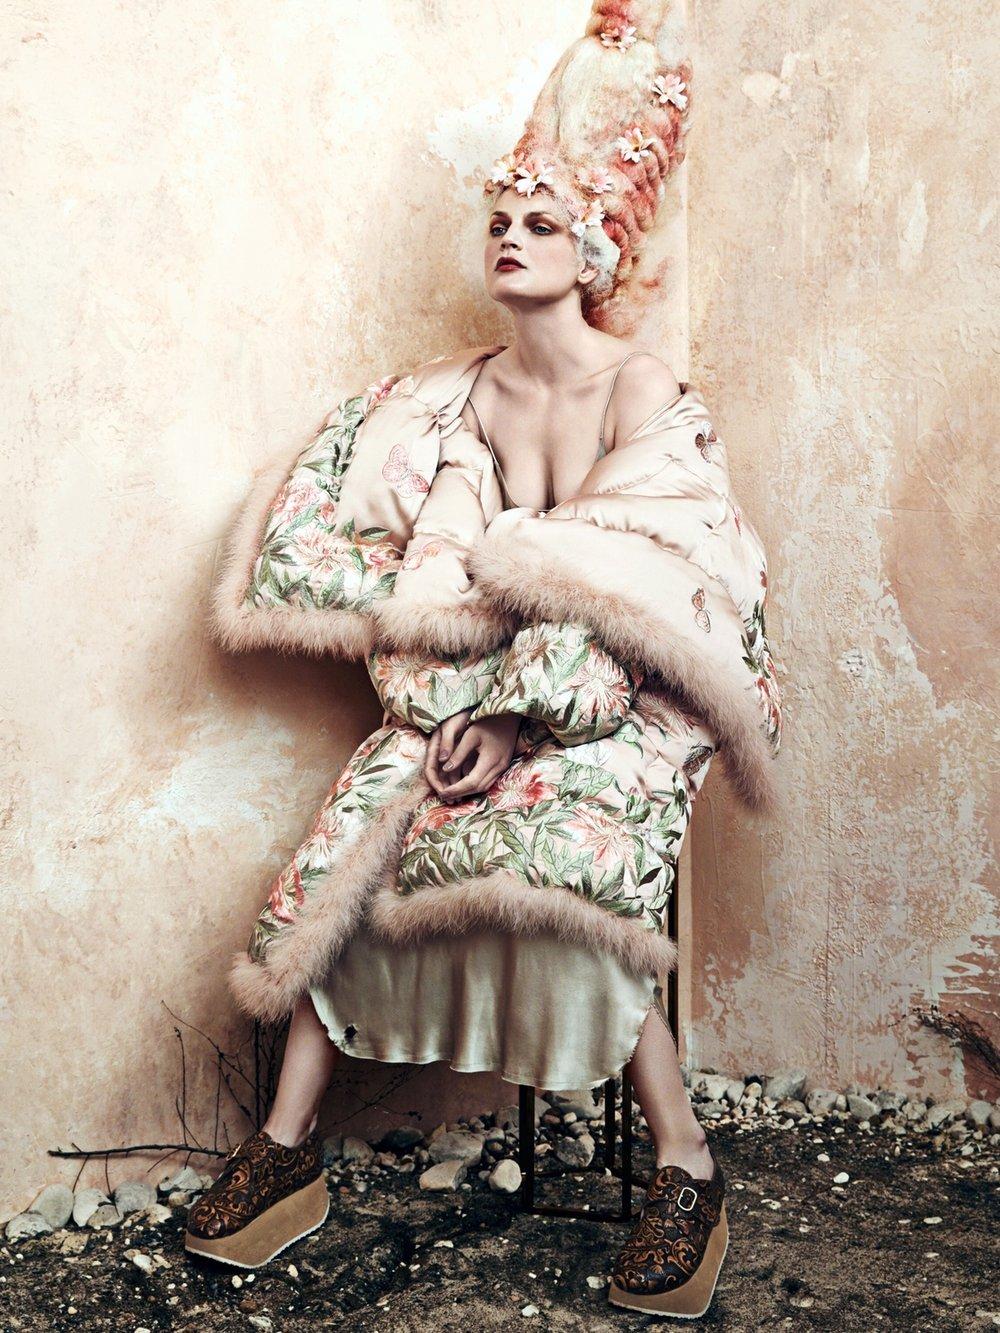 cr-fashion-book-no9-fall-winter-2016-guinevere-van-seenus-by-bjorn-iooss-01.jpg